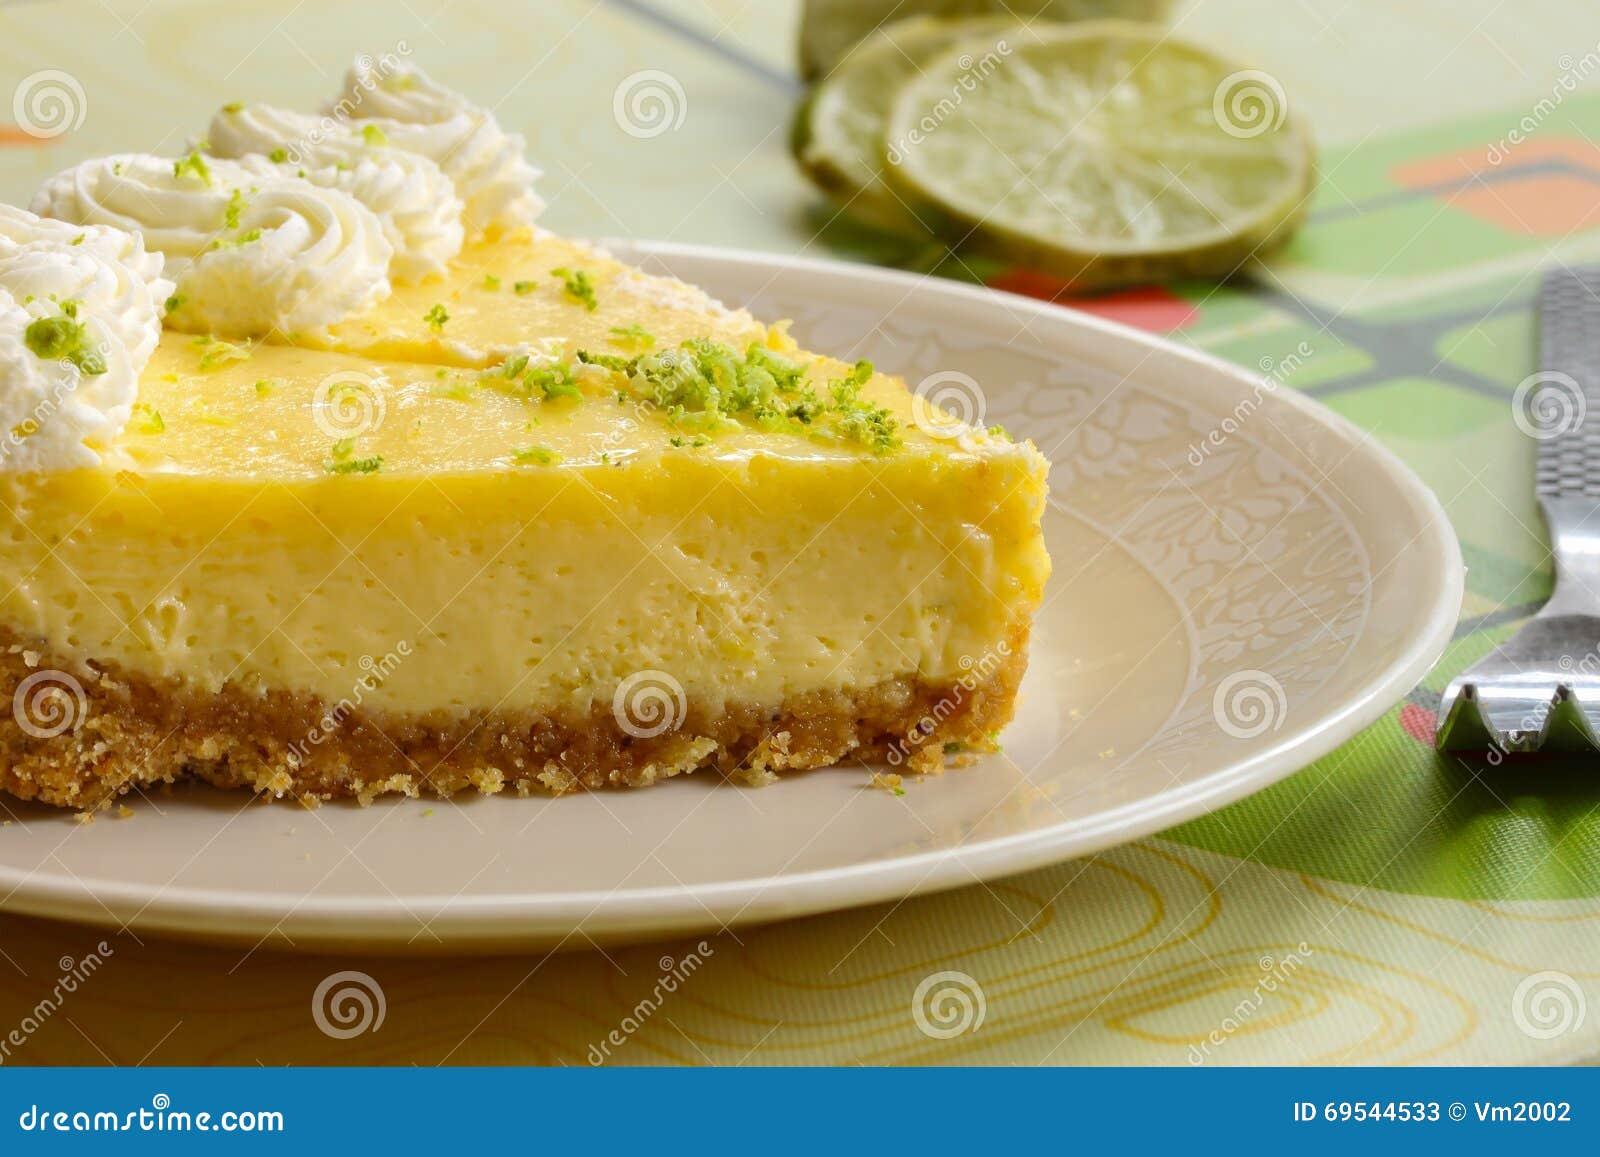 Fatia de alimento do americano da sobremesa da torta do cal chave